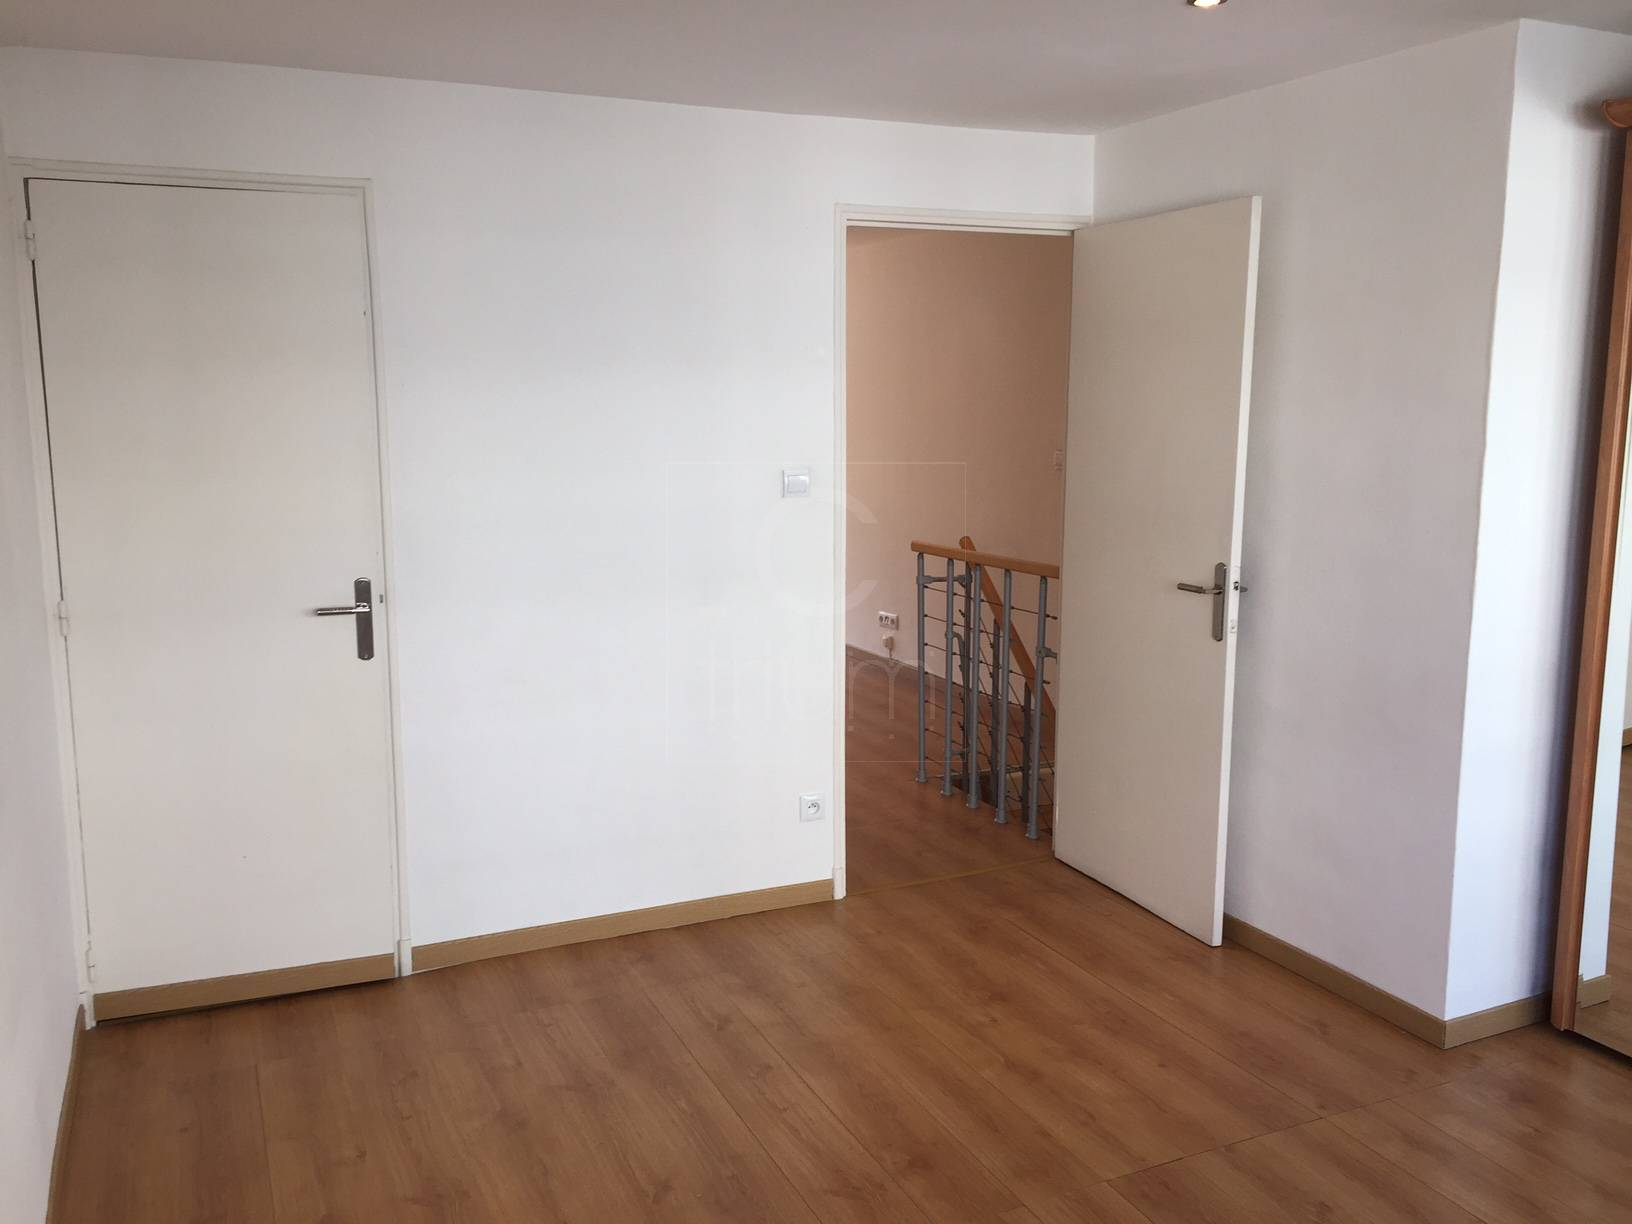 vente duplex t3 f3 marseille carr d 39 or tout neuf agence. Black Bedroom Furniture Sets. Home Design Ideas